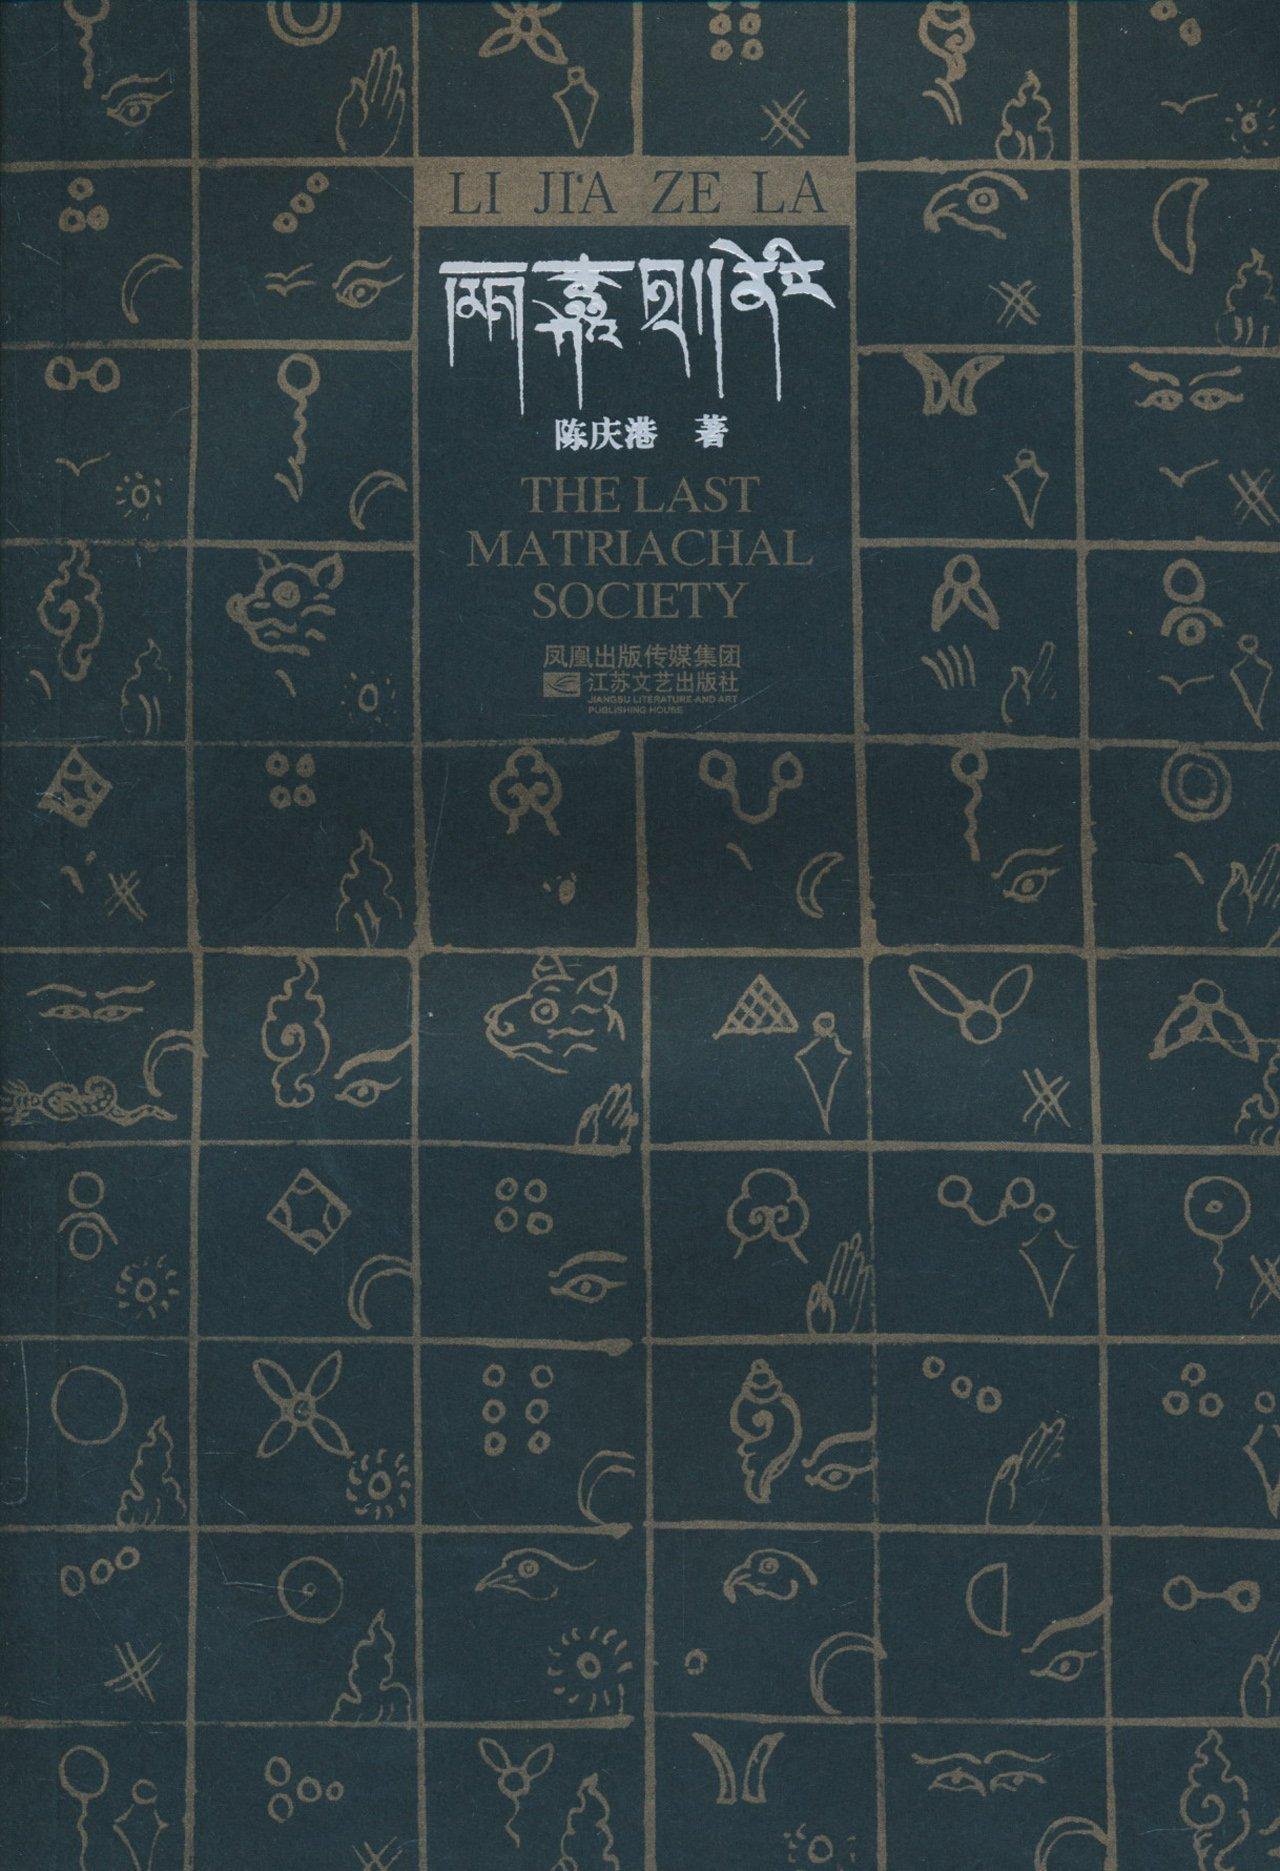 Lijiazela:The Last Matriarchal Society丽嘉则拉 Chen Qinggang陈庆港